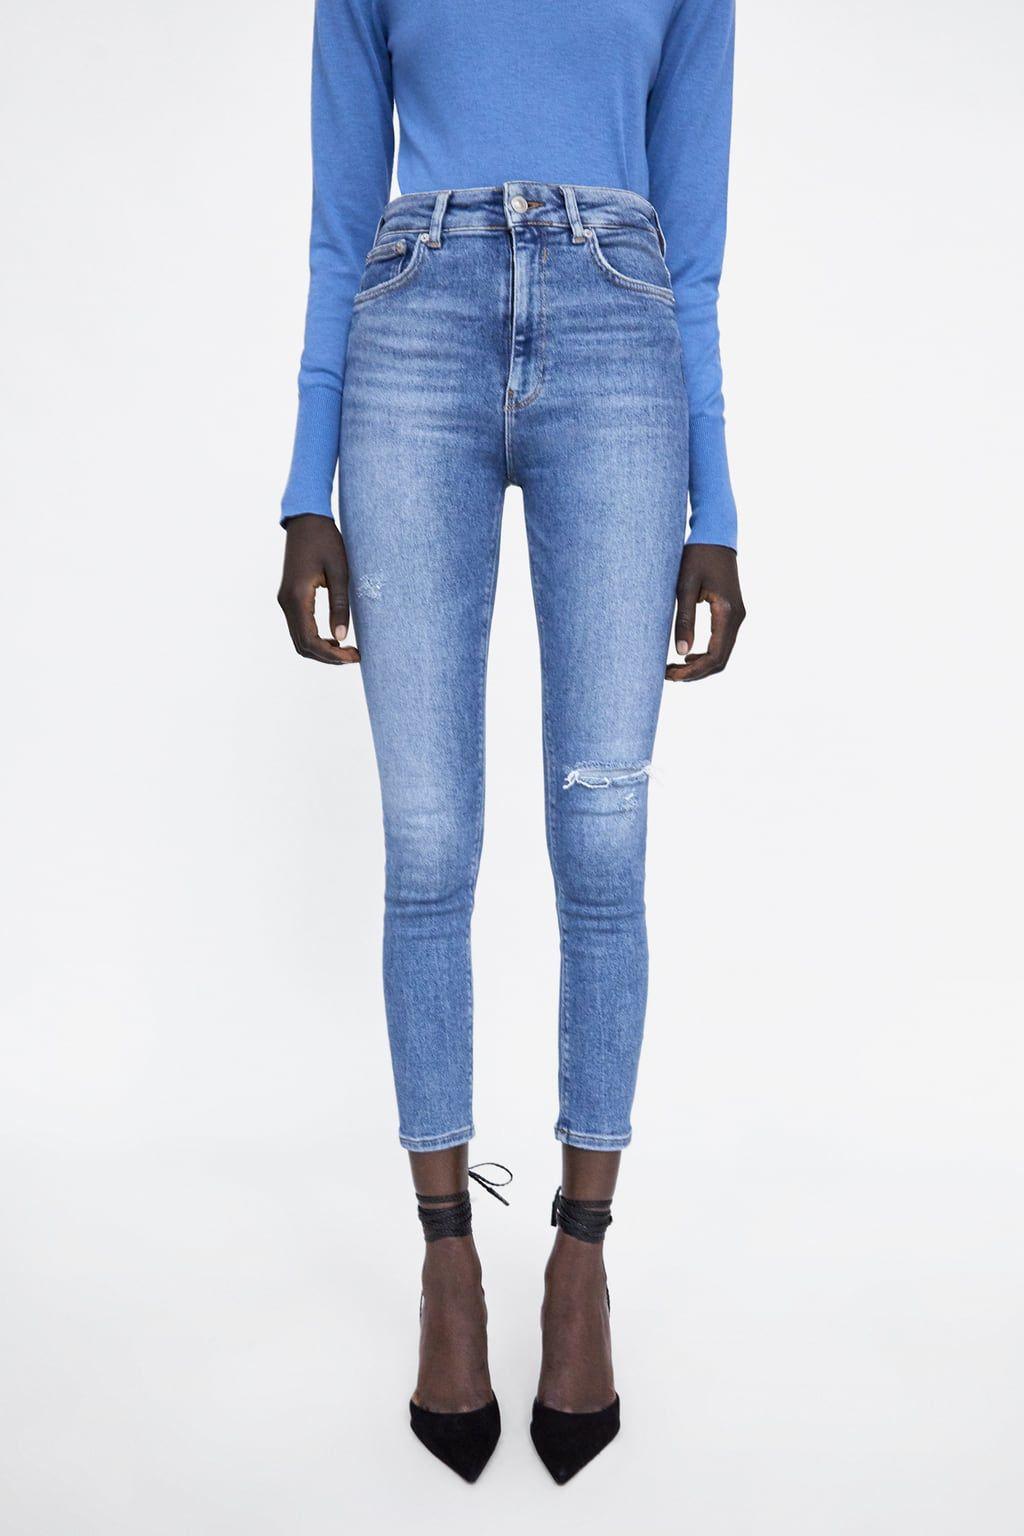 9f5367bb Jeans zw premium 80s high waist venice blue in 2019   Fa-fa-fashion ...